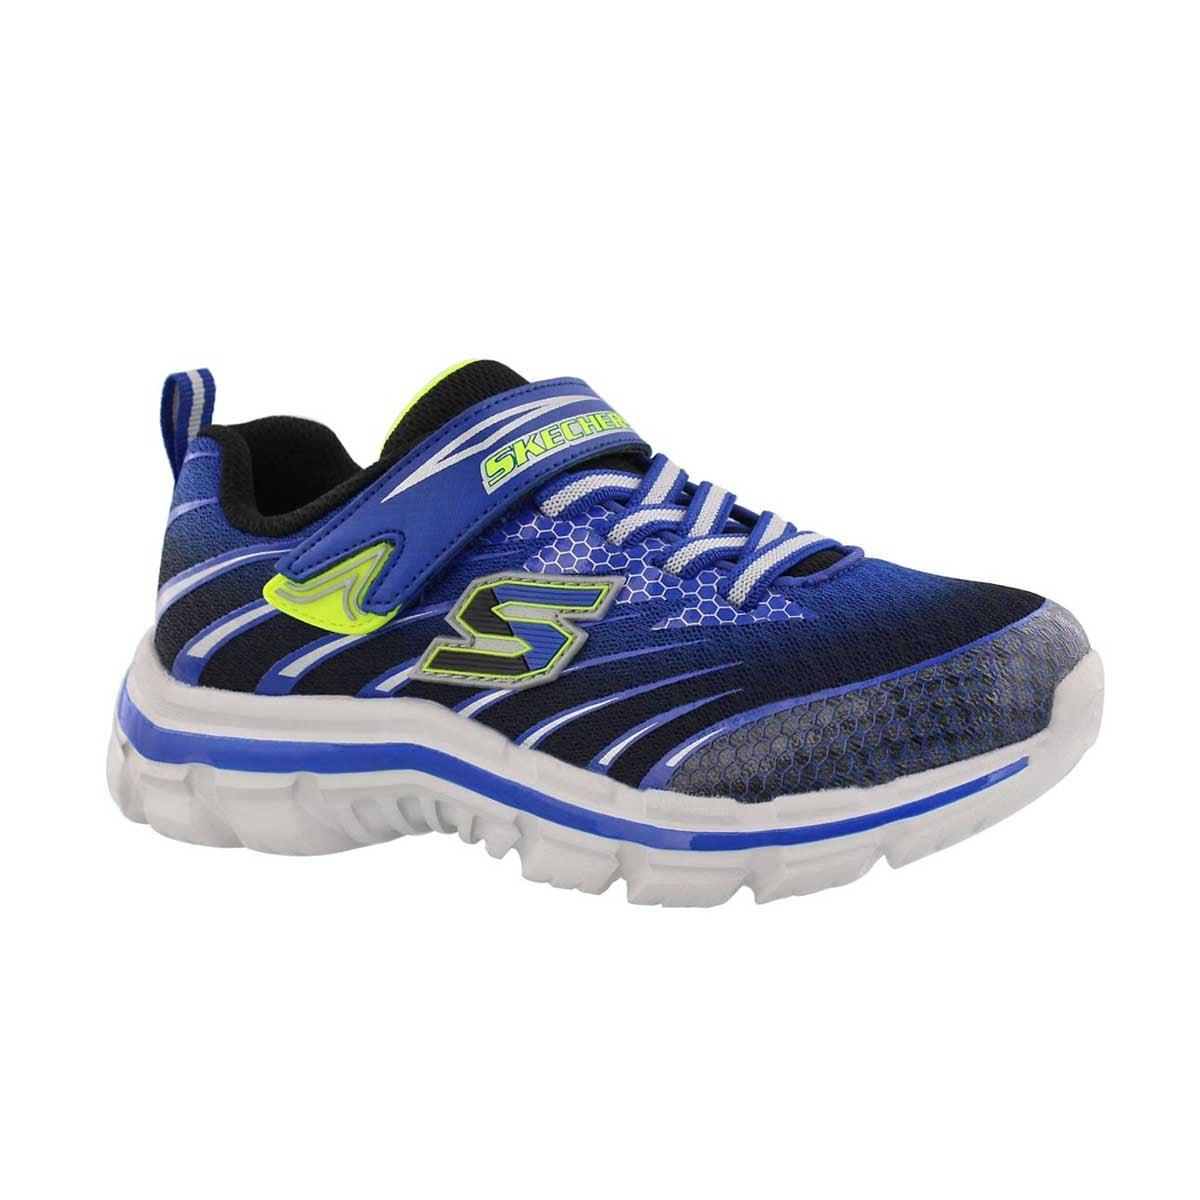 Boys' NITRATE PULSAR blue/black sneakers